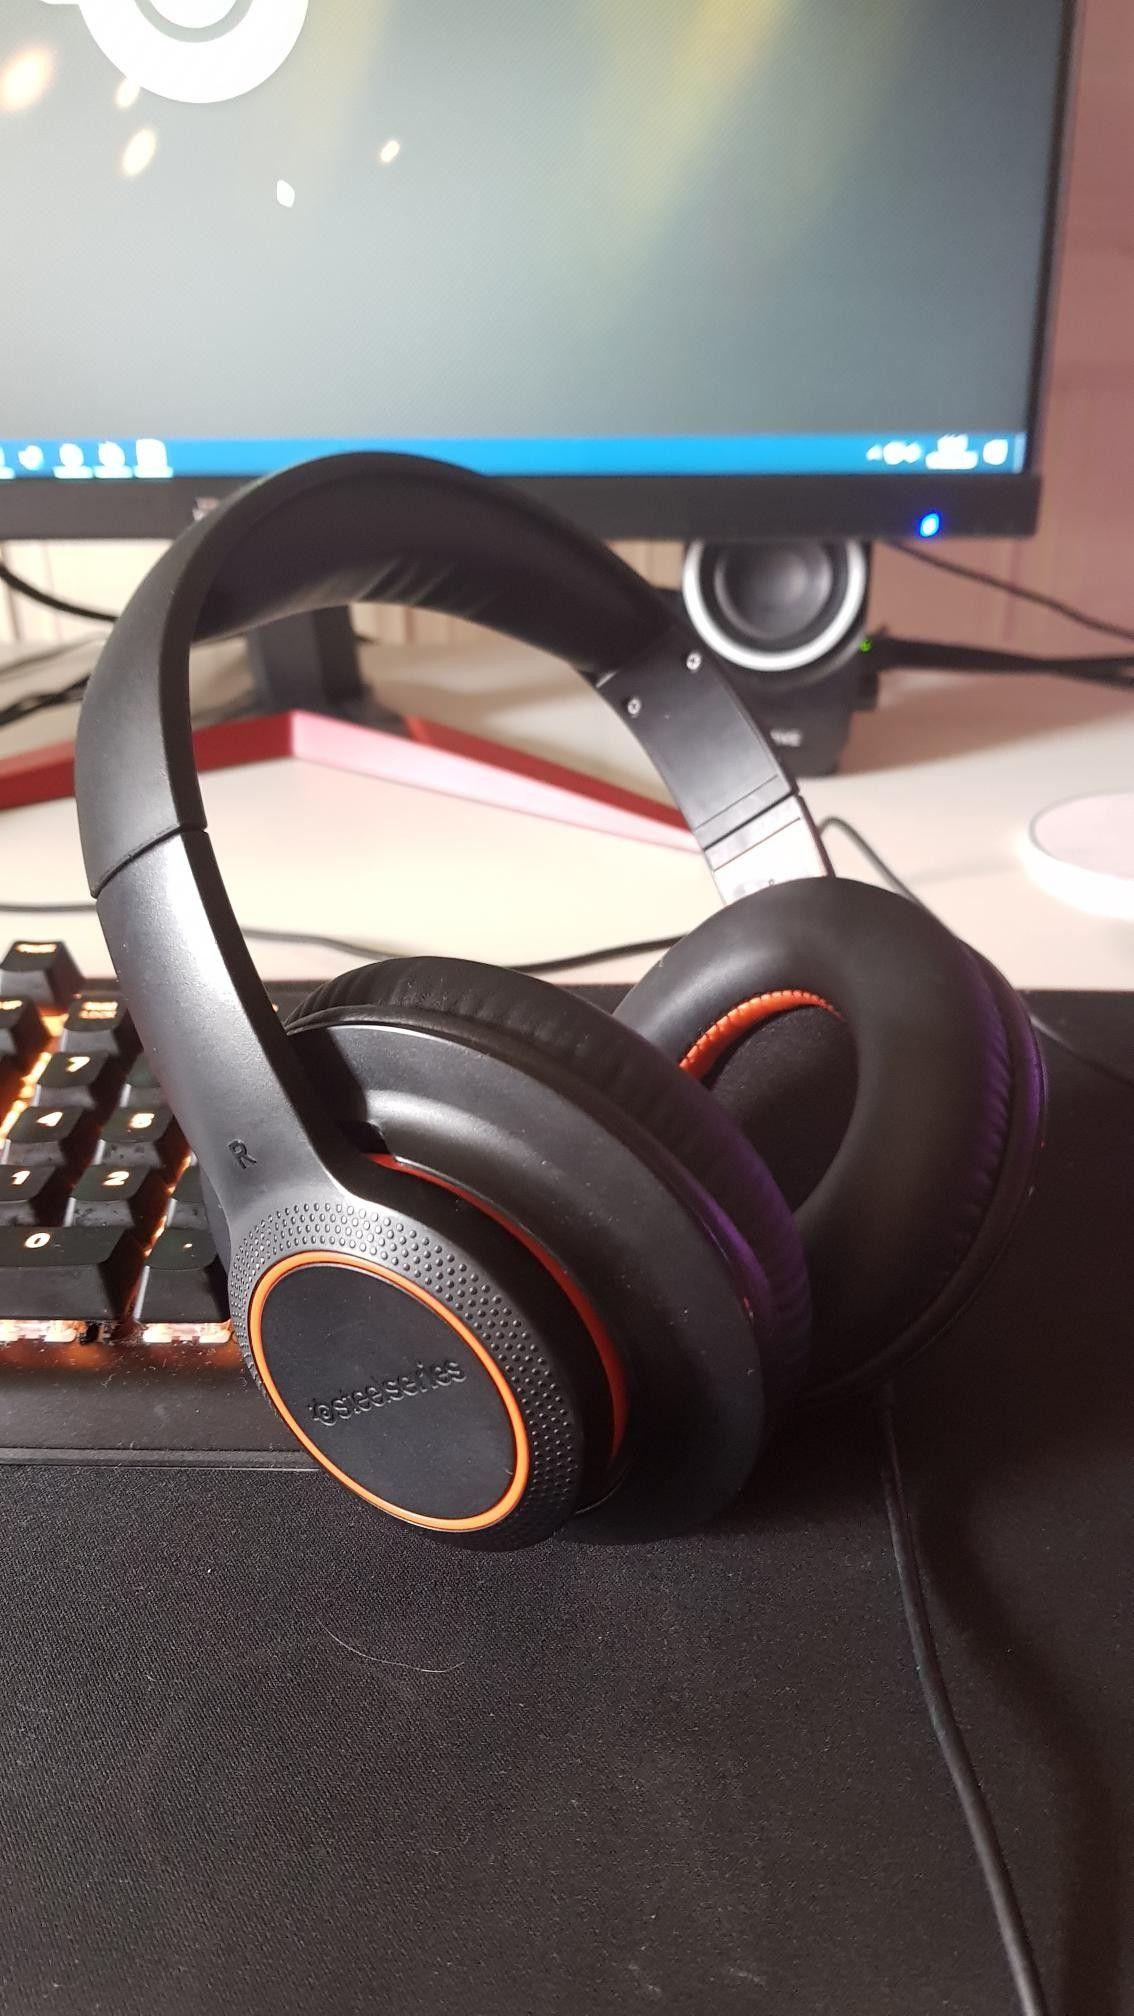 Steelseries Gaming Headset mmikrofon | FINN.no